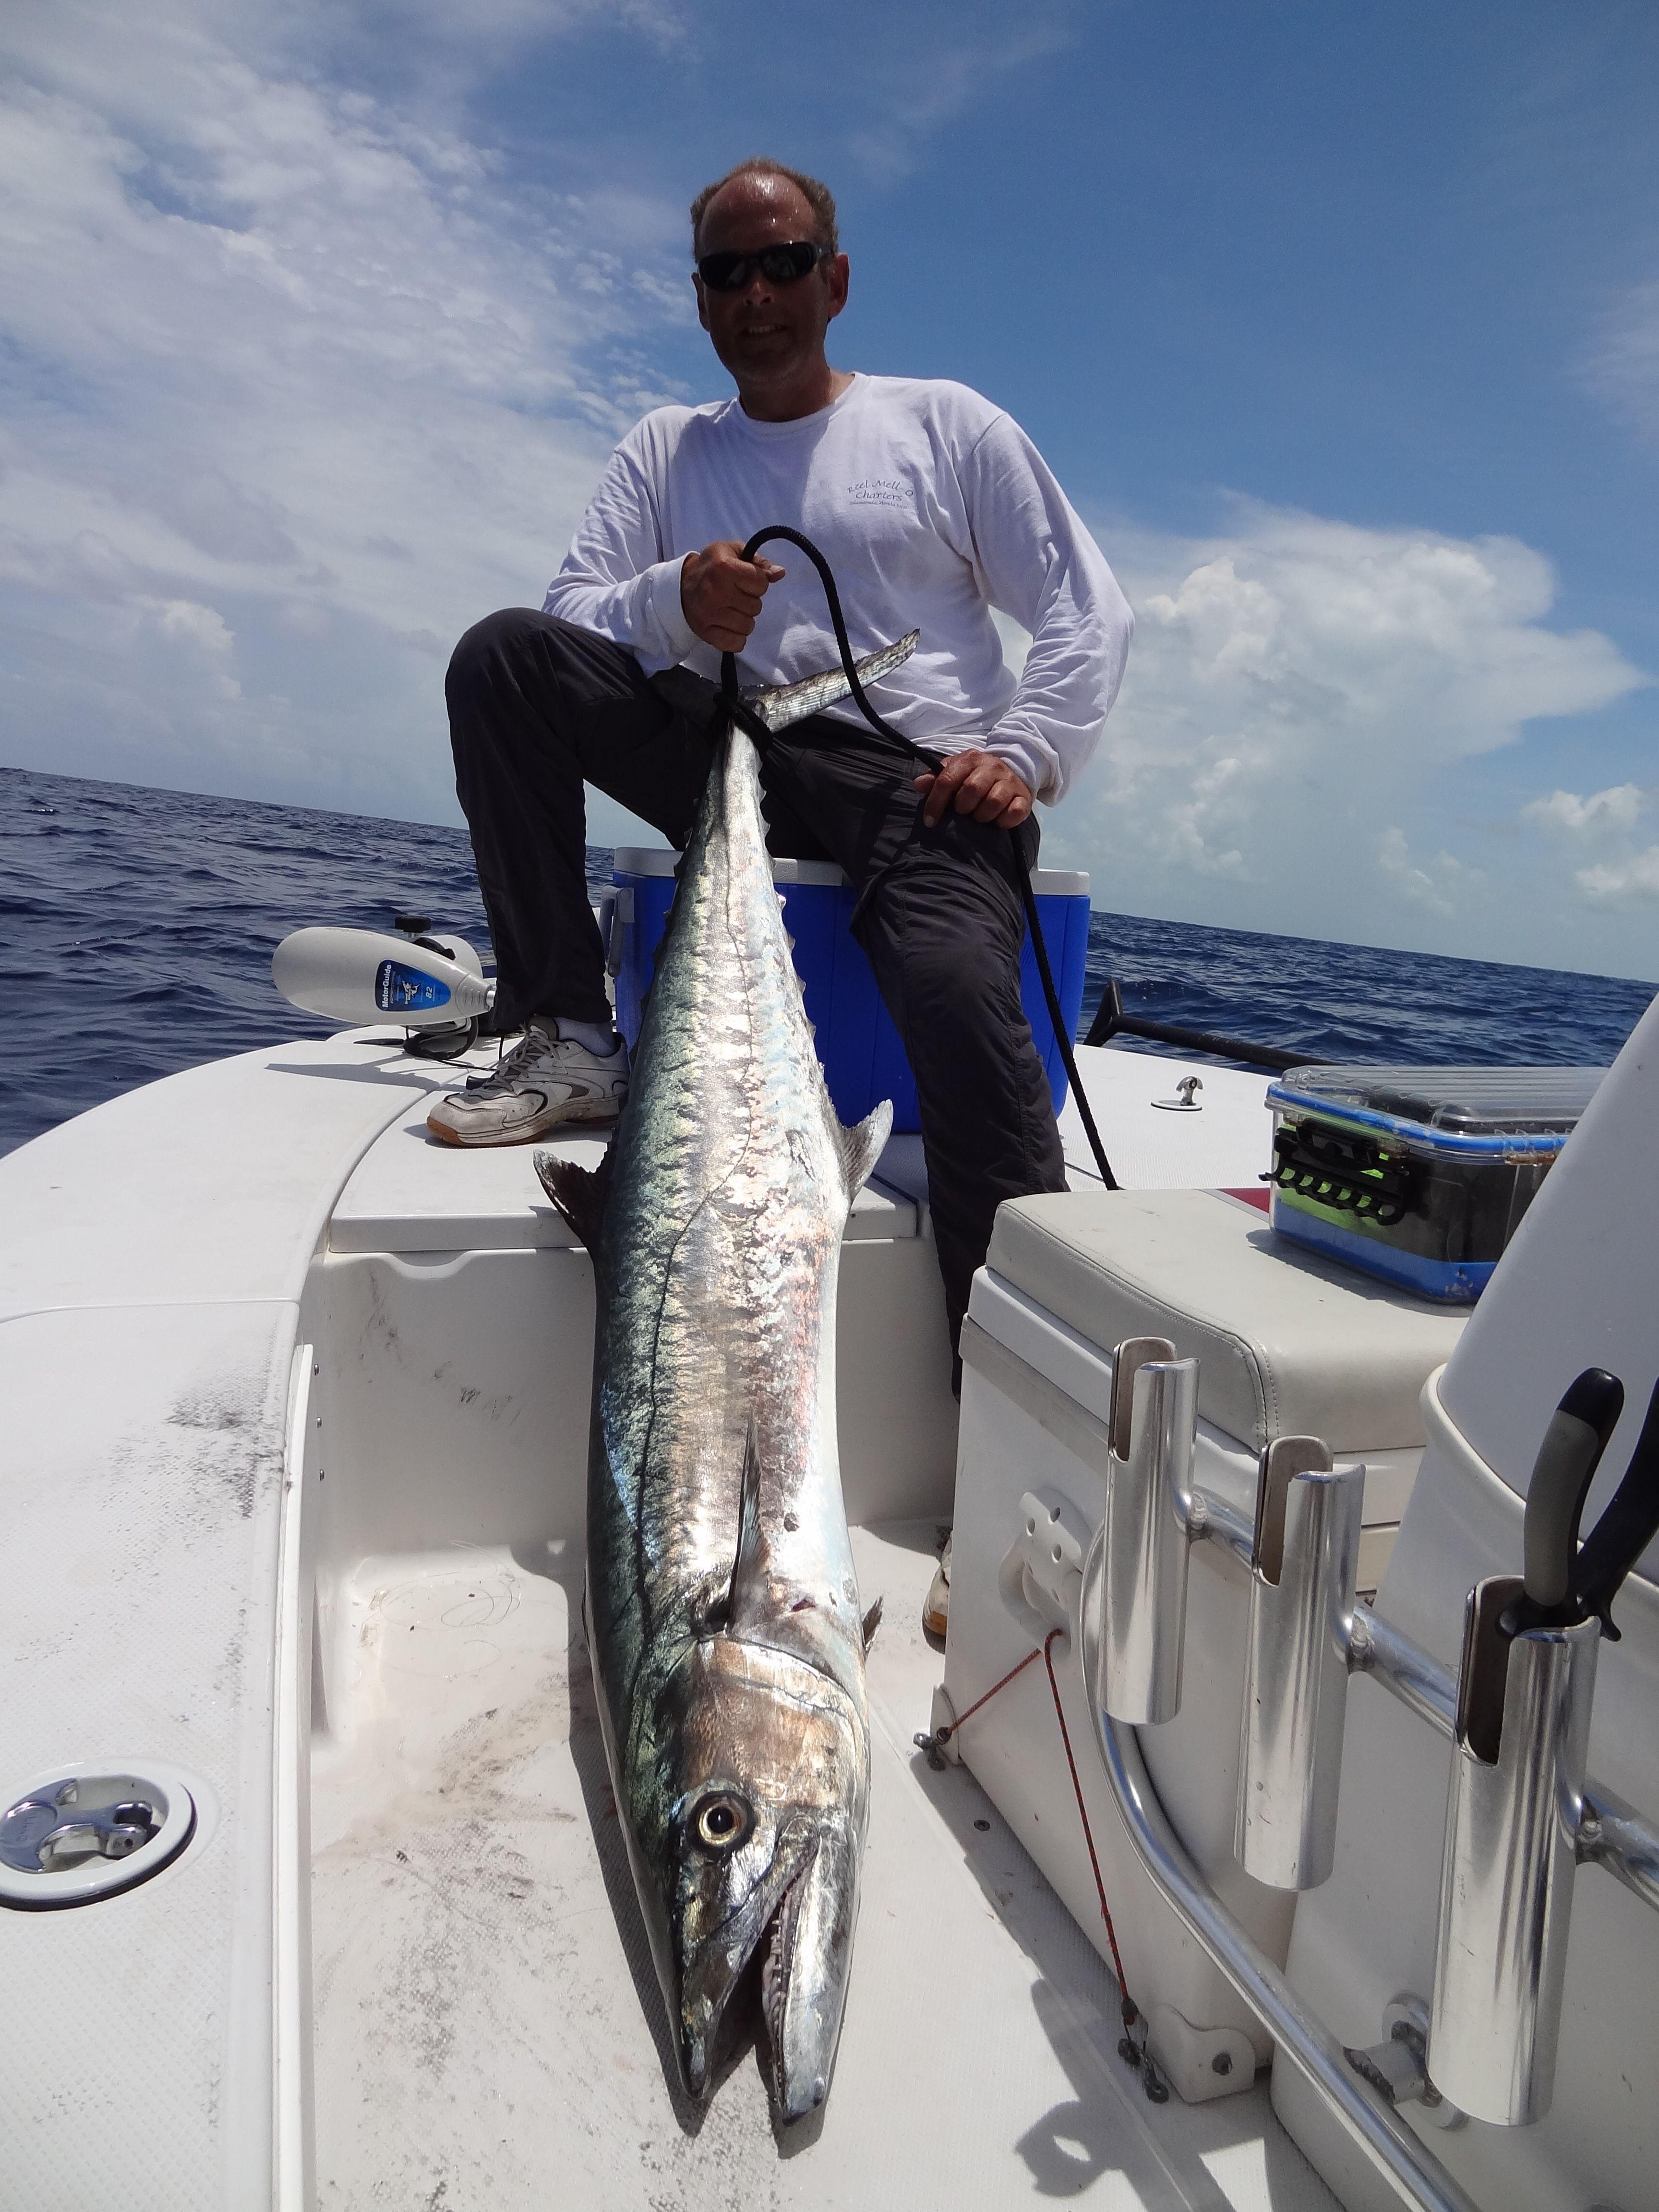 Mike Mell With A Huge Kingfish Kingfish Www Reelmello Com Salt Water Fish Fish Fish Art